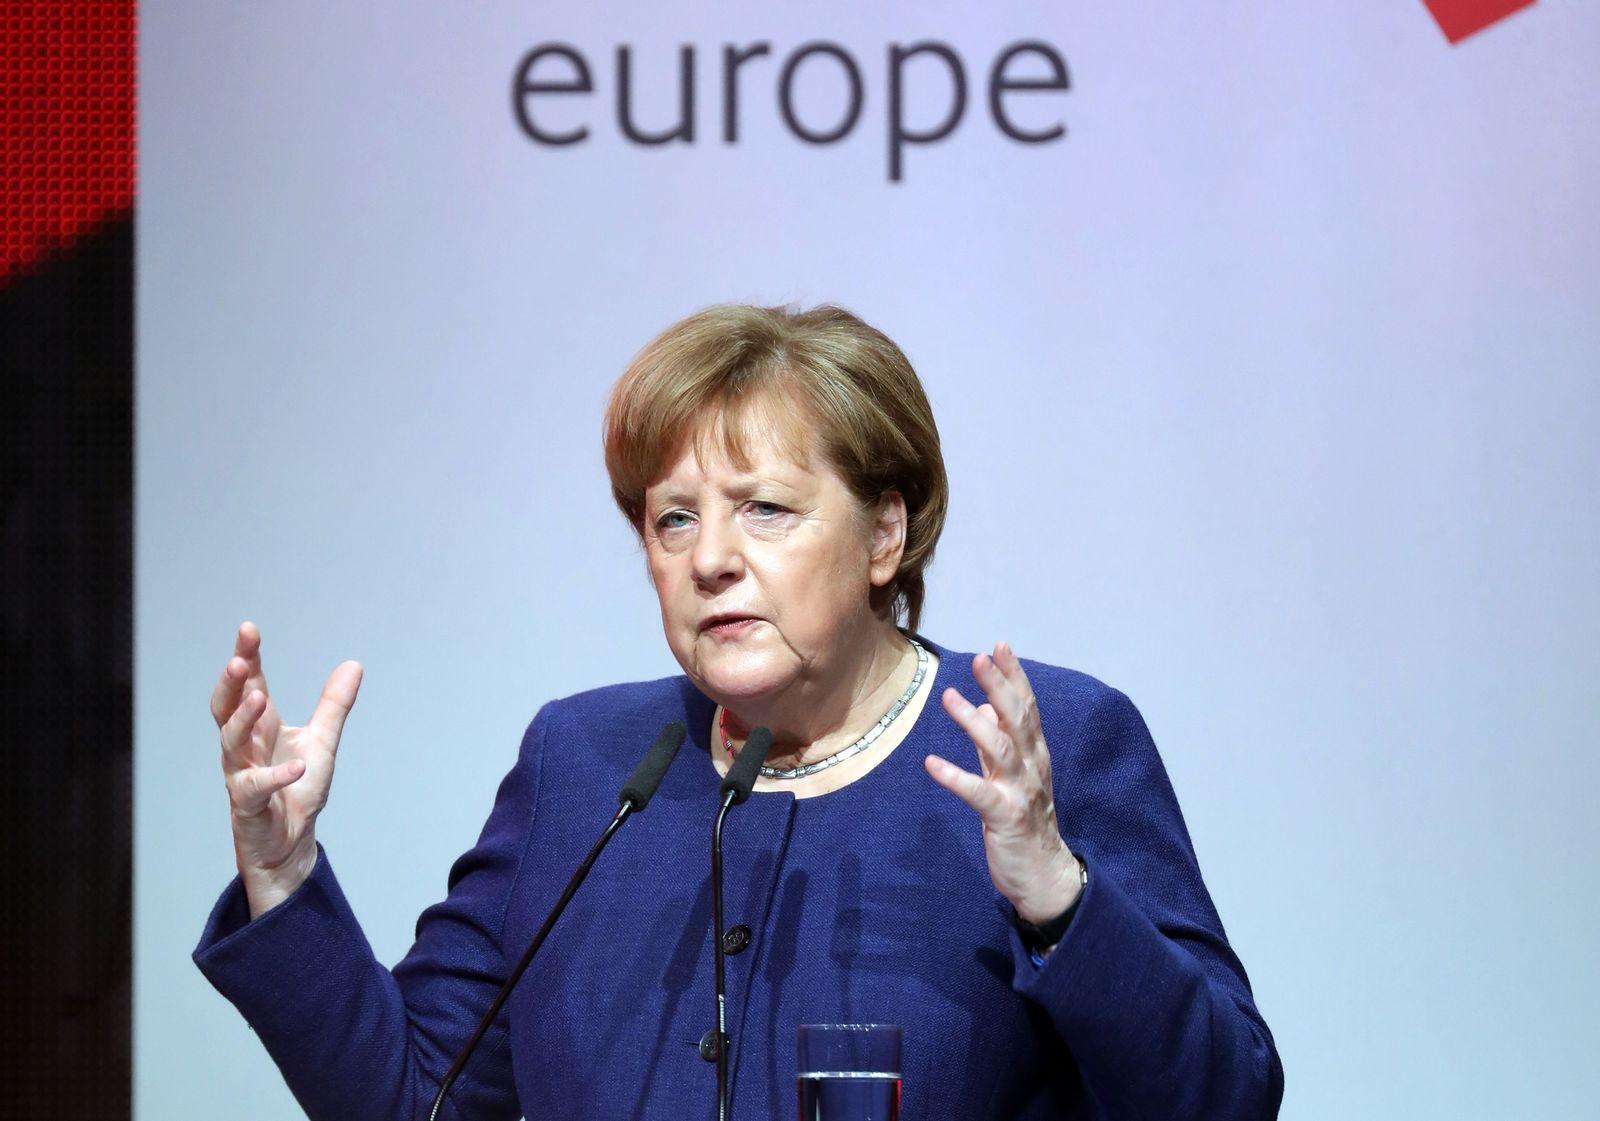 Angela Merkel/ Digitising Europe Summit